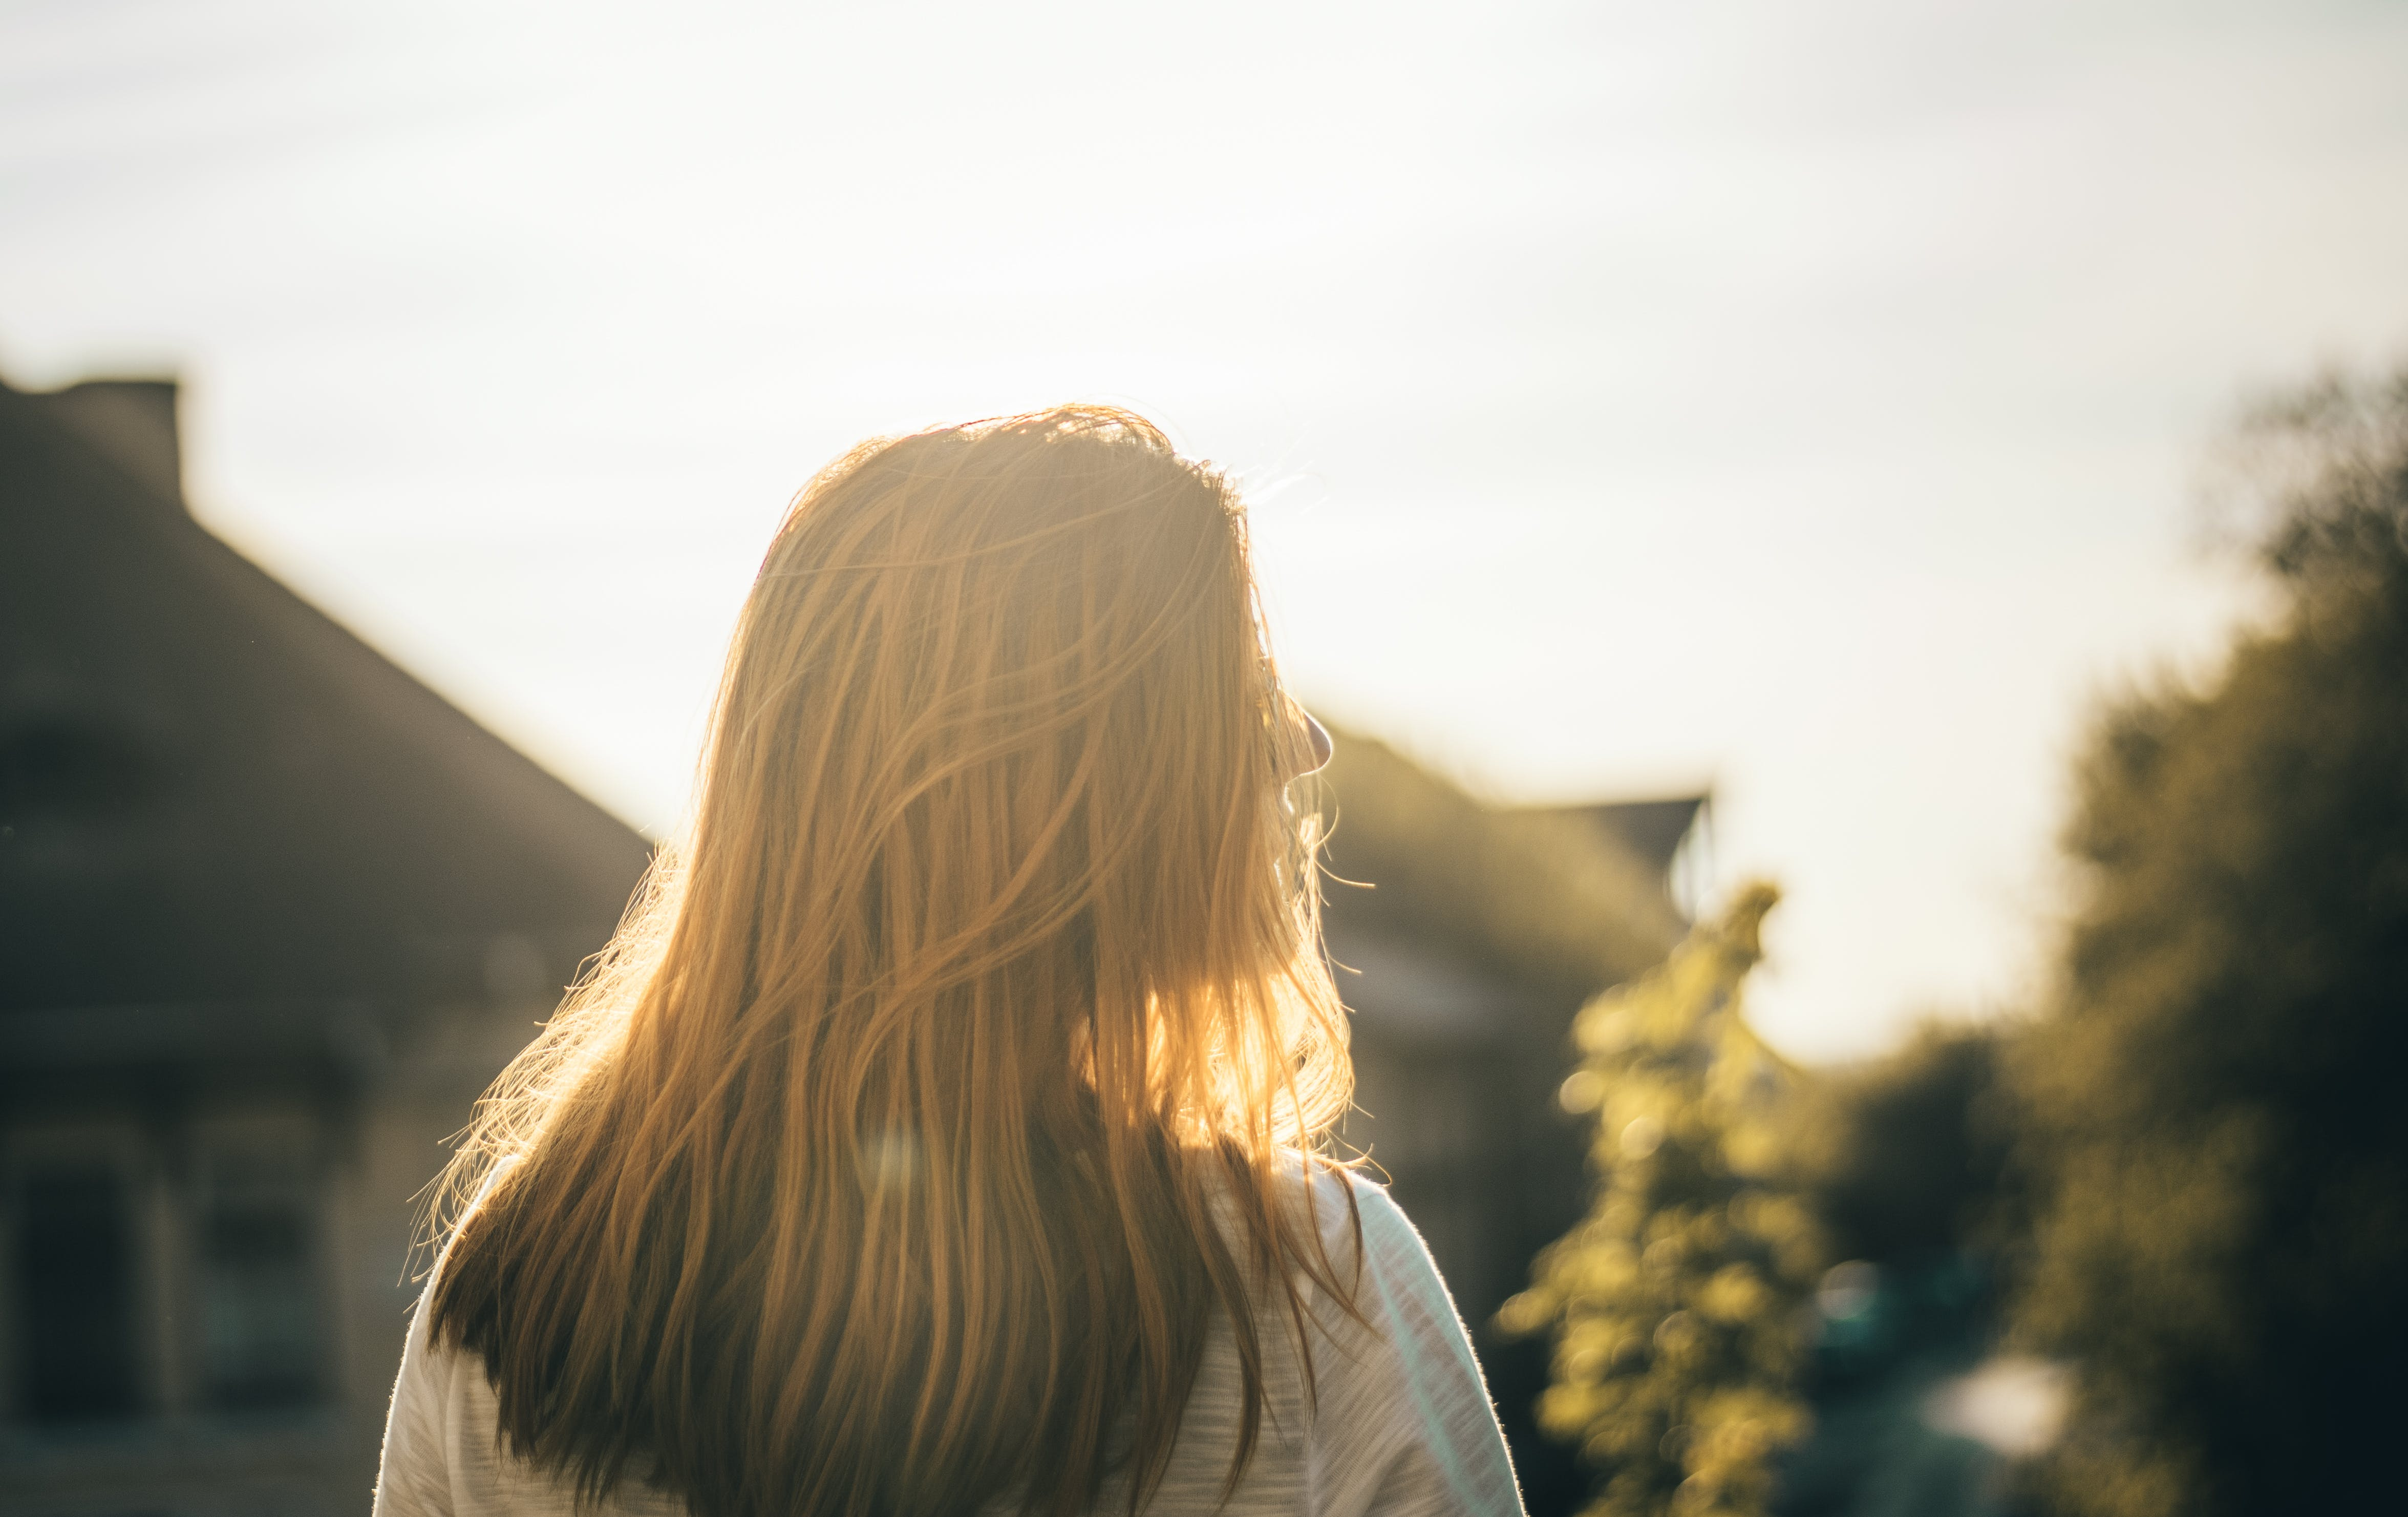 Close-Up Photo of Woman Facing Sideways